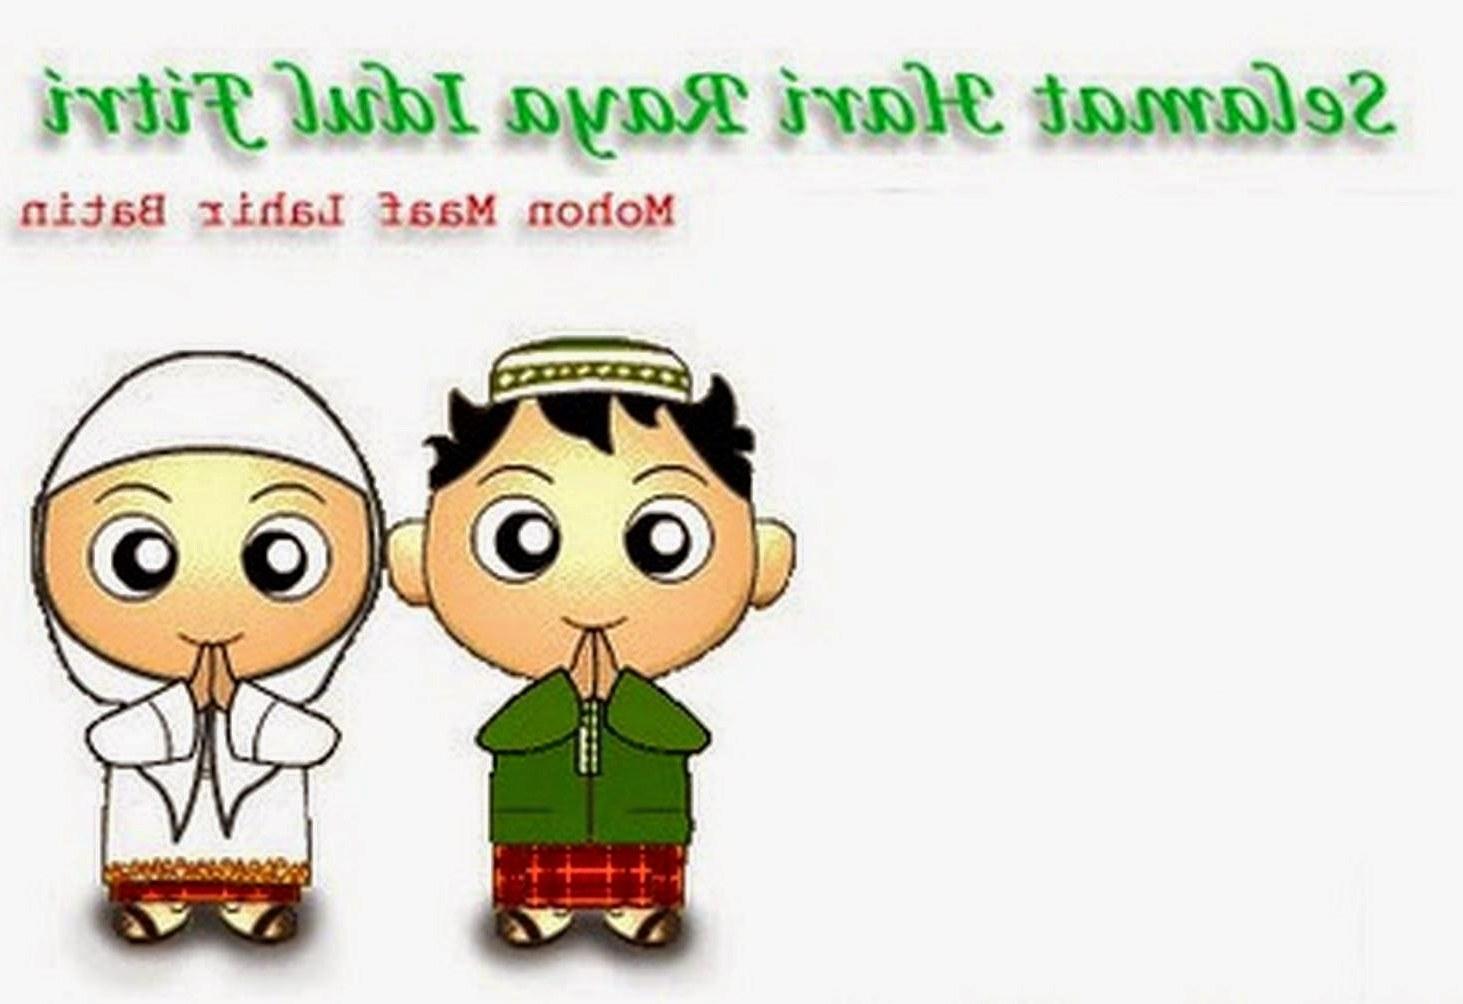 Model Gambar Baju Lebaran Lucu Whdr Gambar Kartun Muslimah Hari Raya